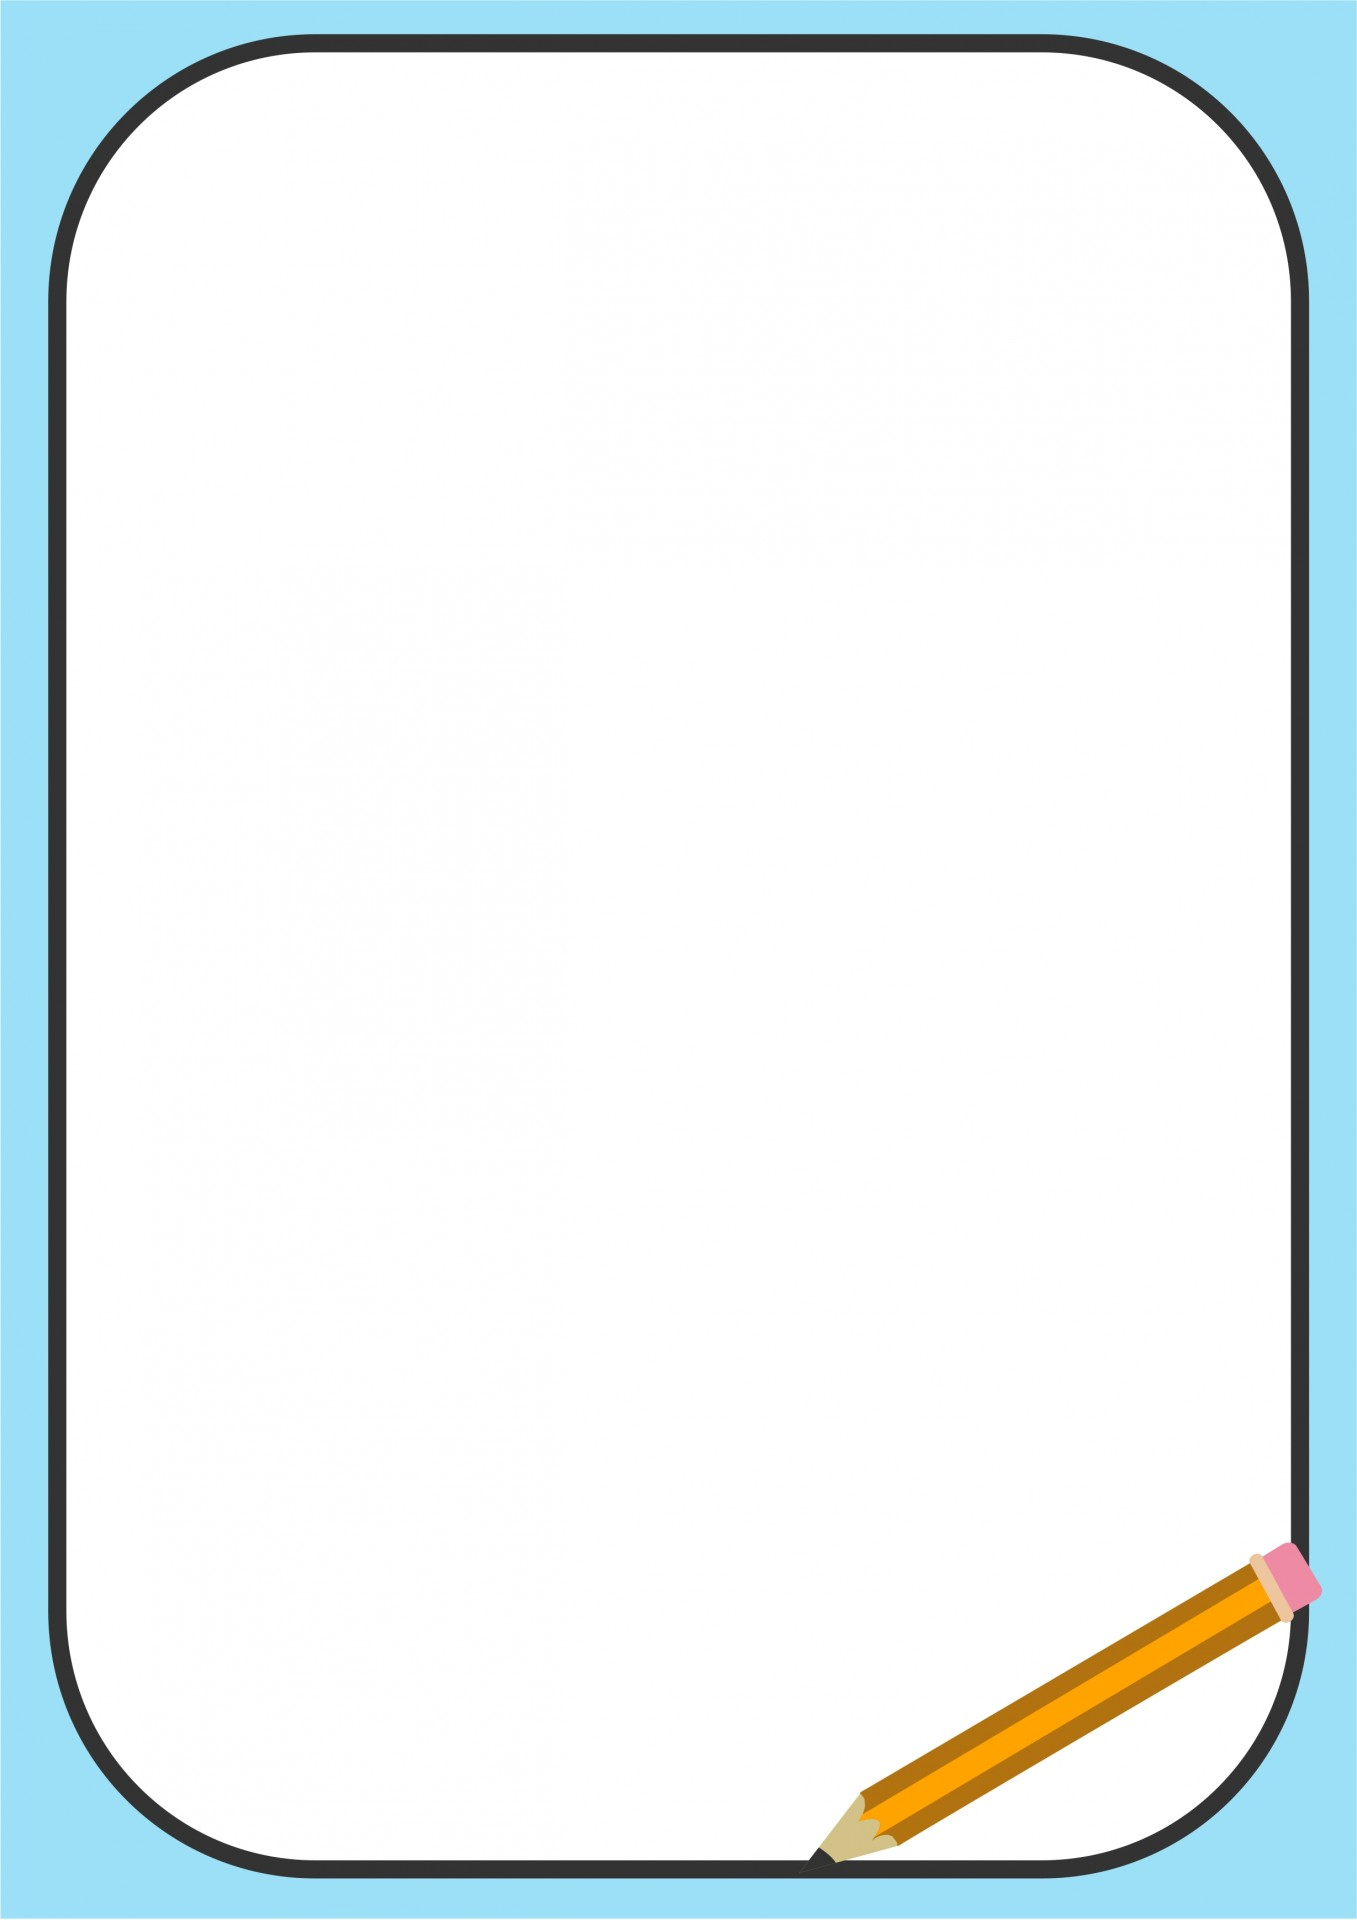 1357x1920 Pencil Border Clipart Free Stock Photo